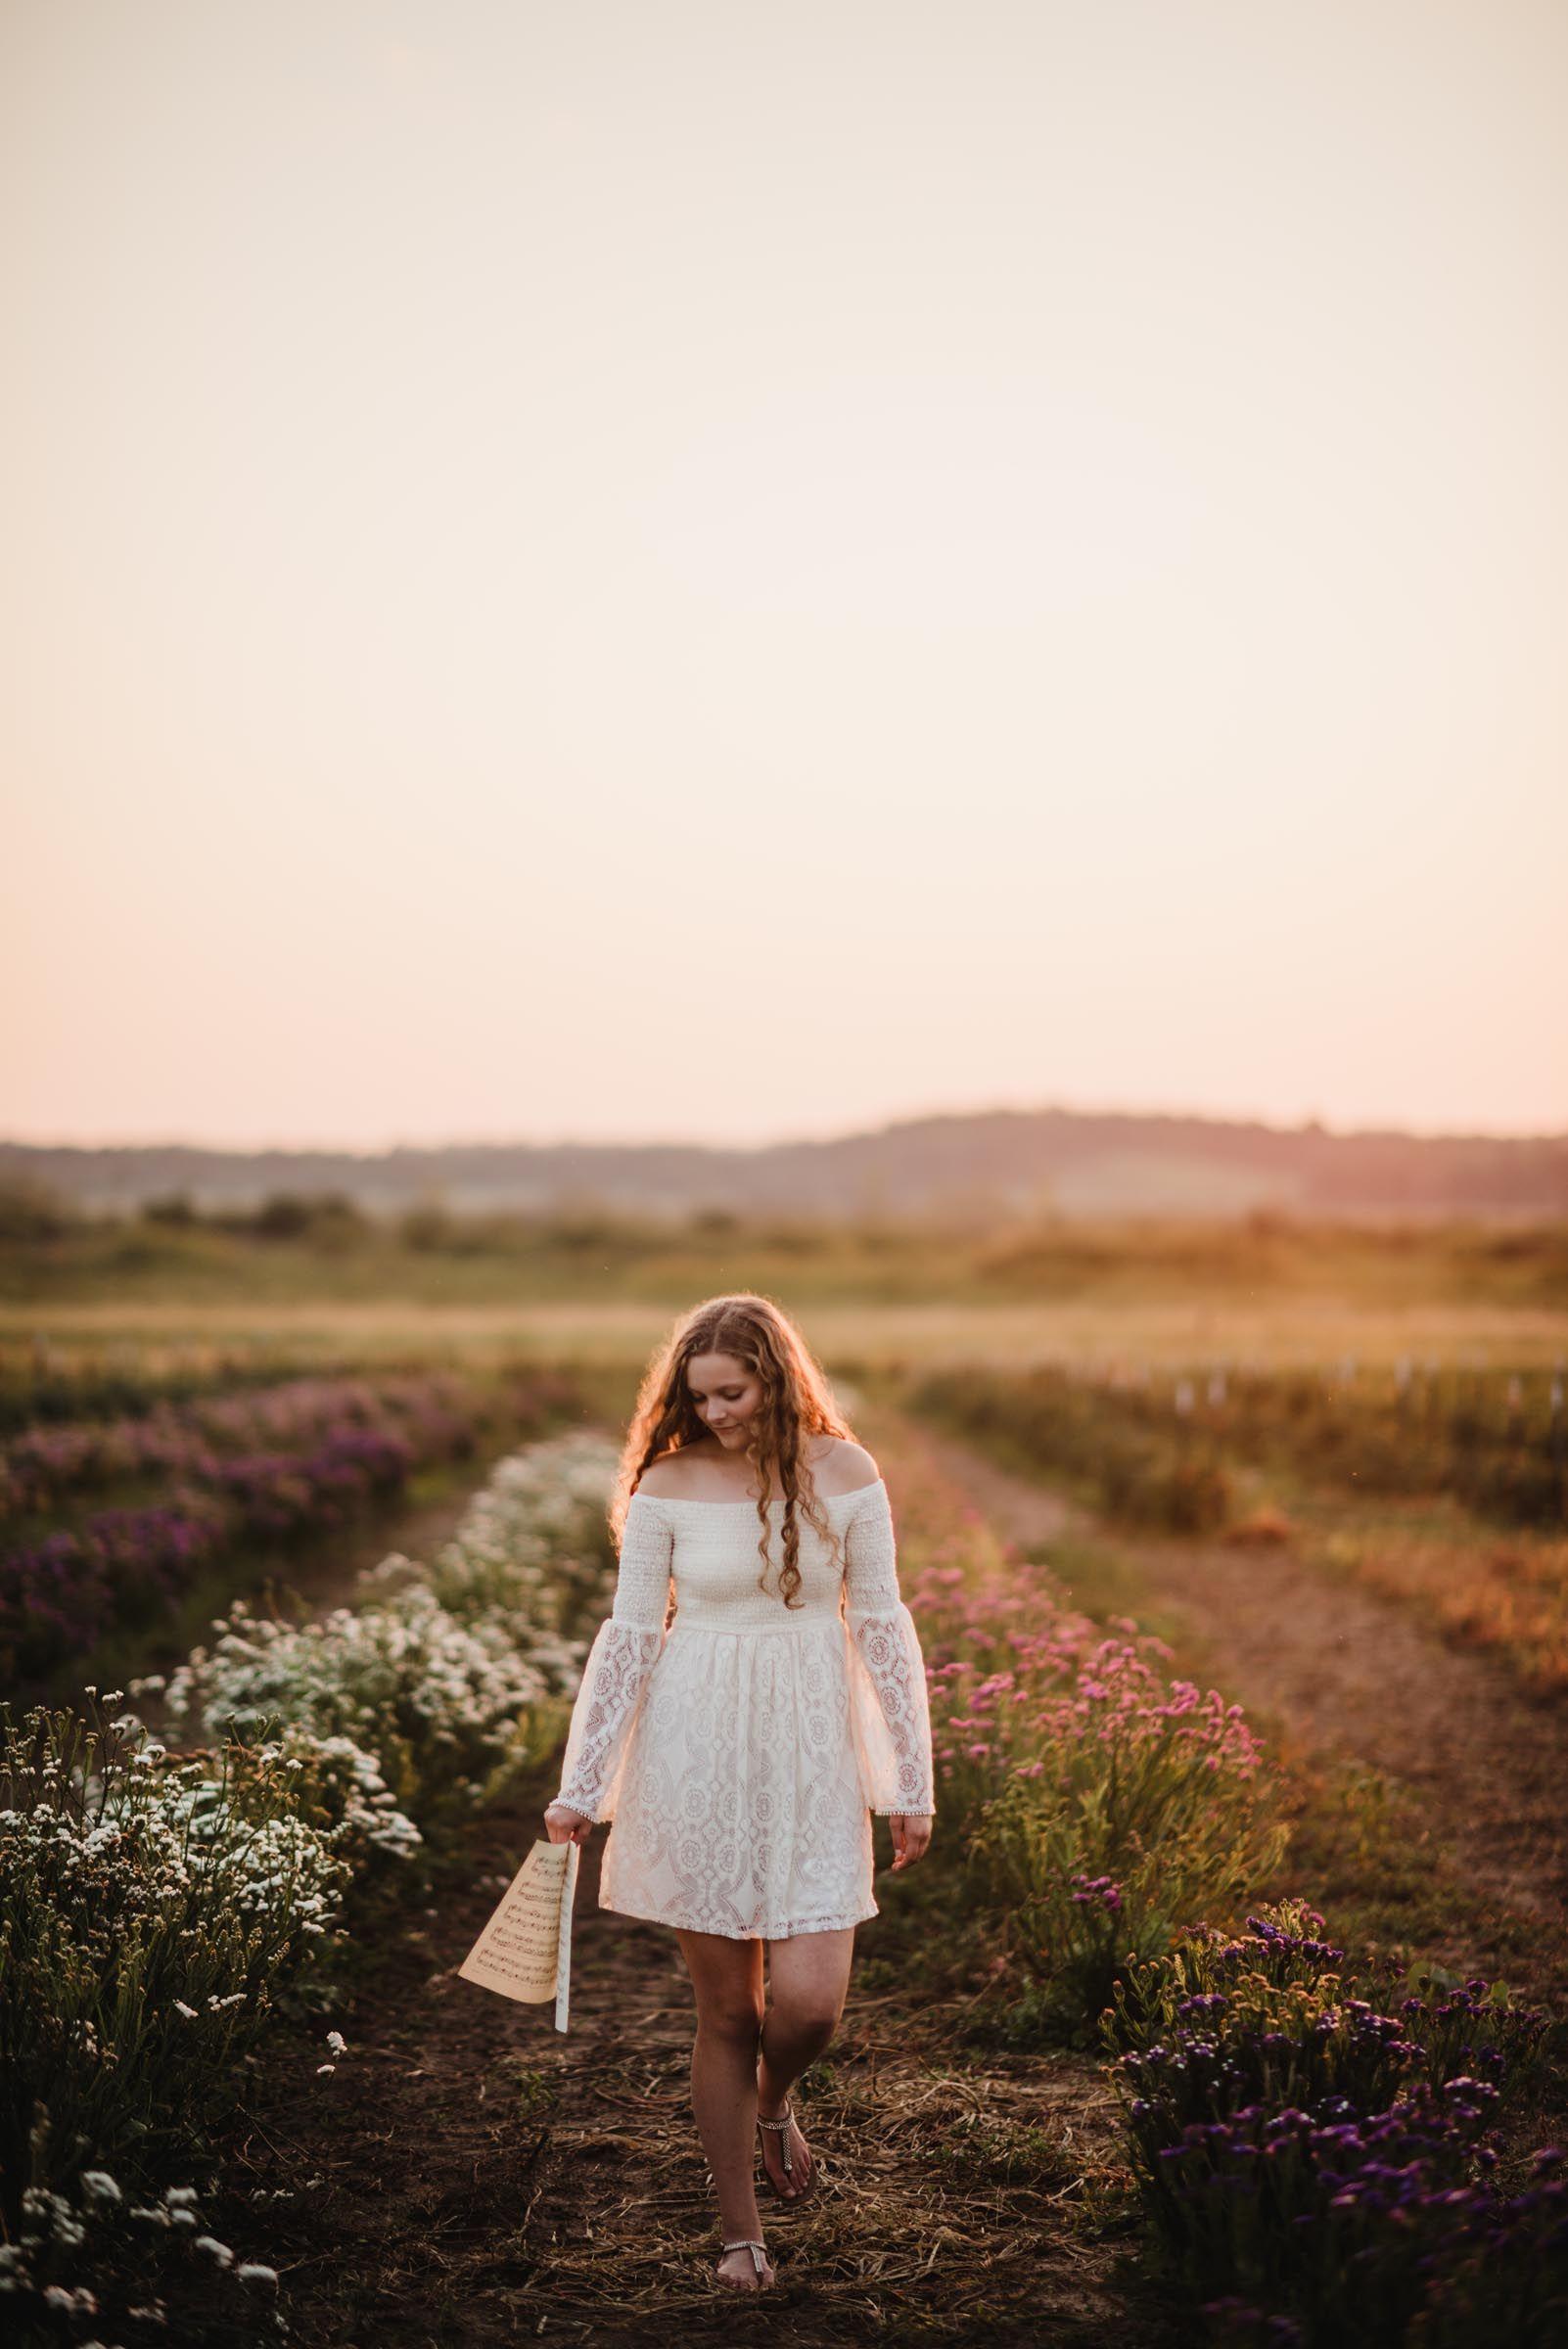 sunset photo with senior girl in white dress